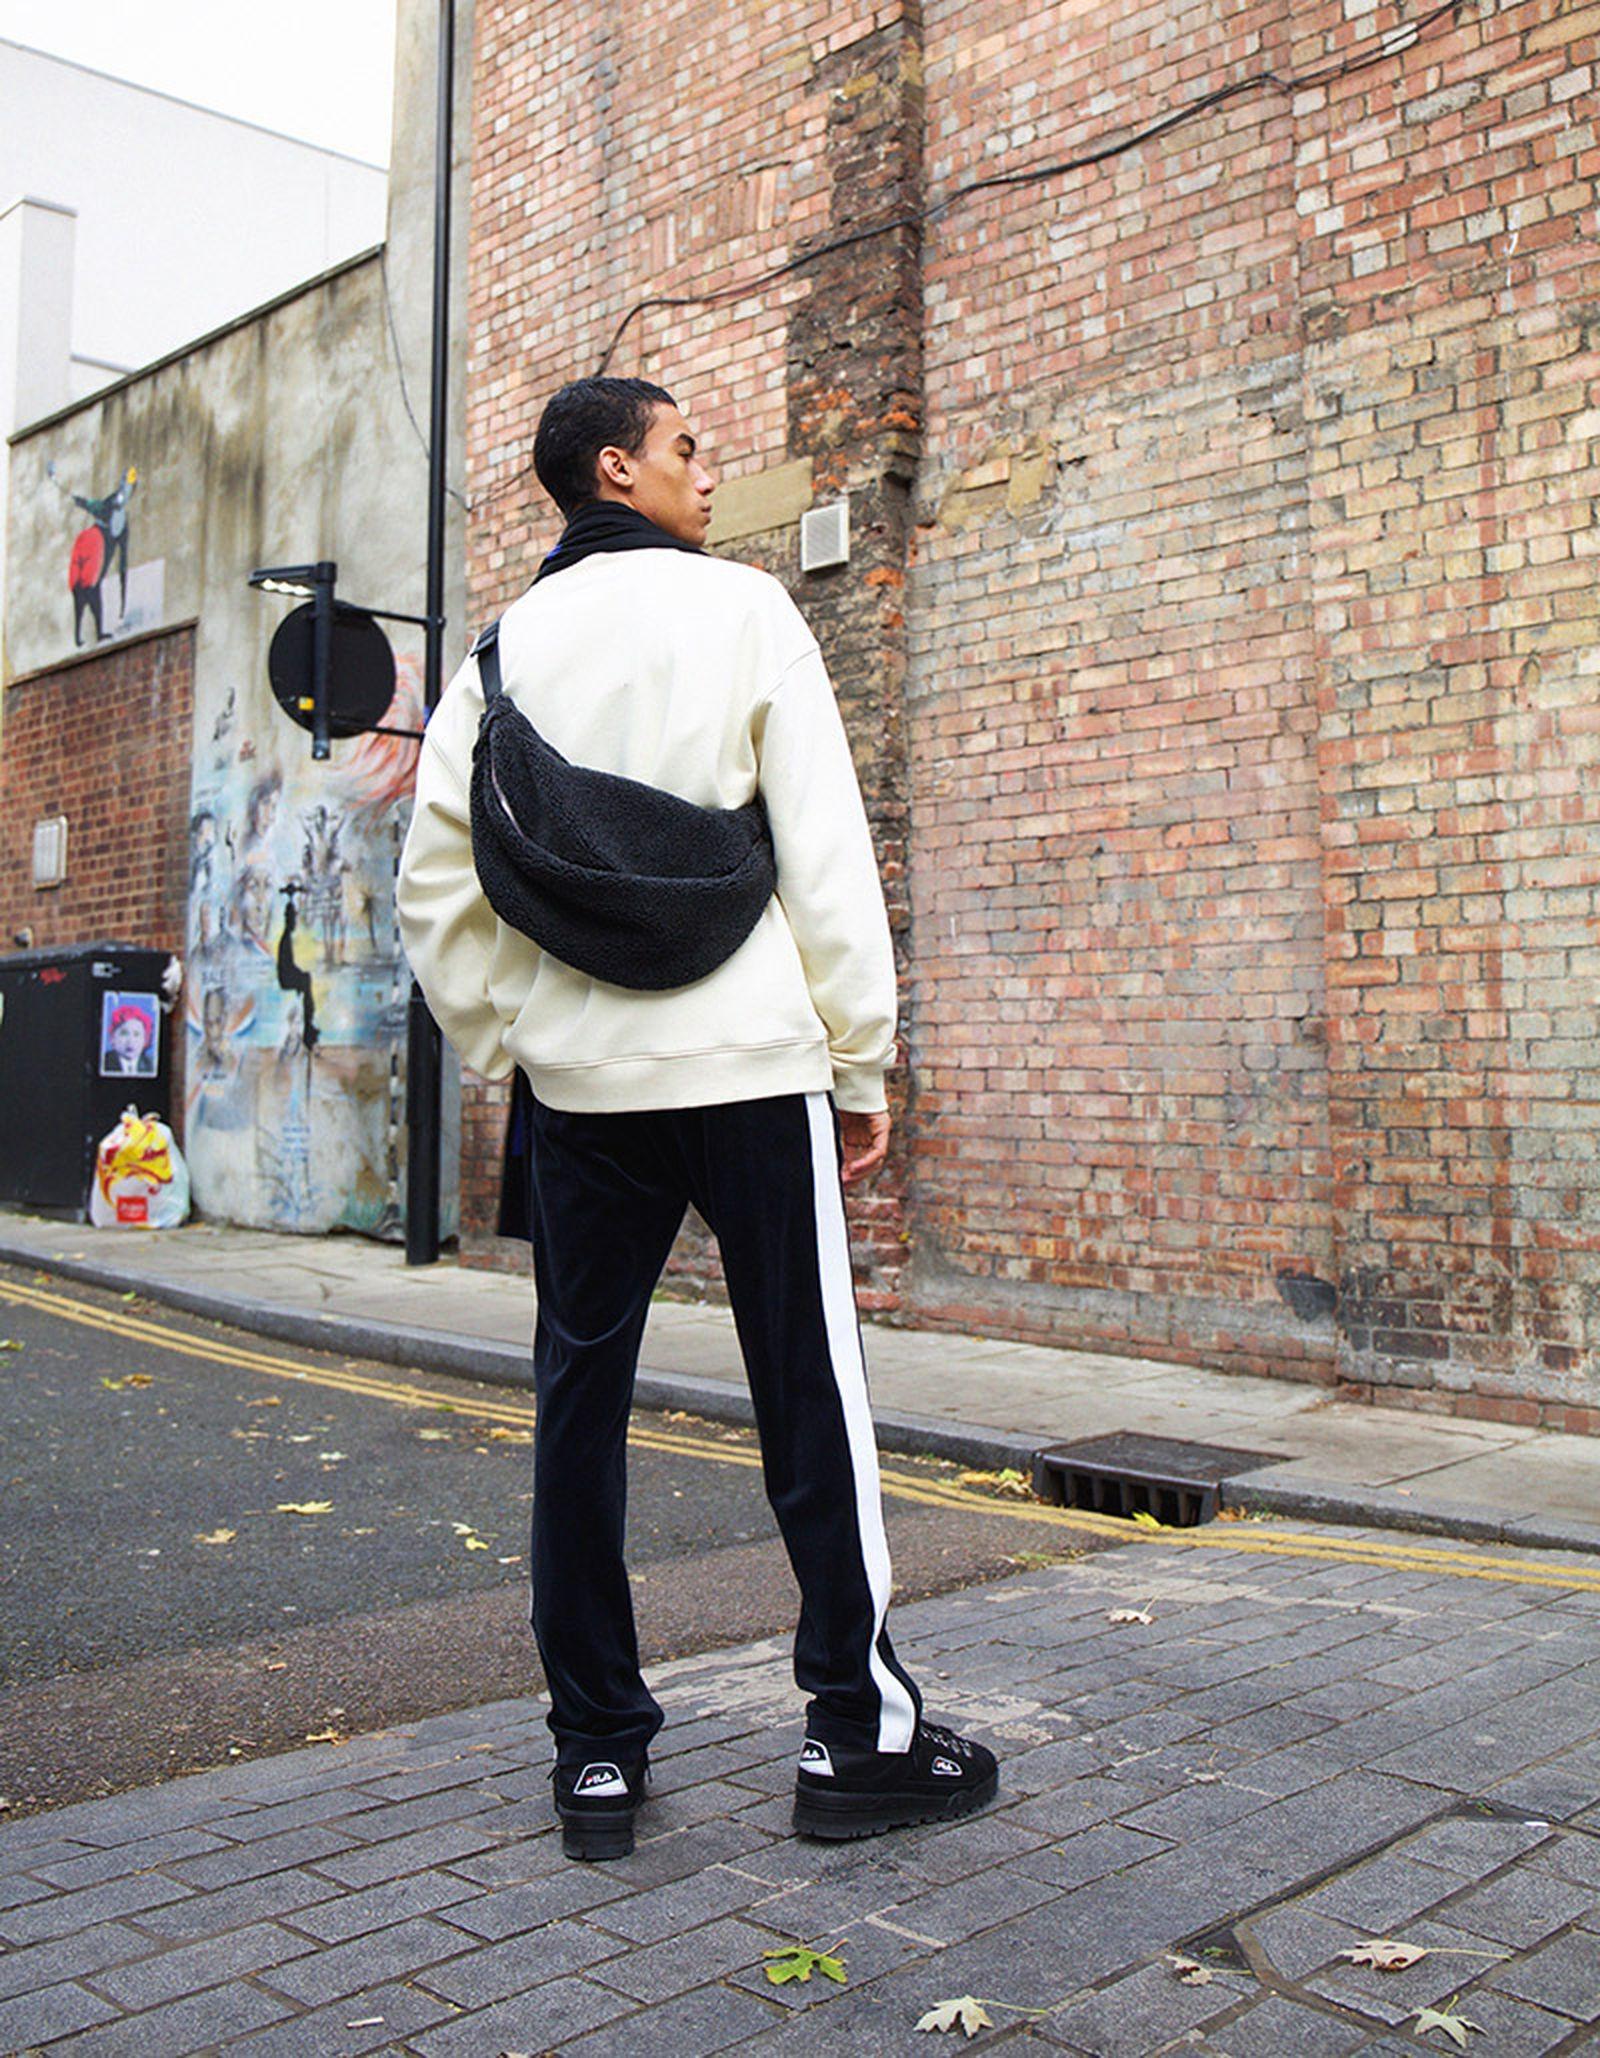 Big Steve Sweatshirt, Local Velour Sweatpants, Meridian Scarf & Park Pile Shoulder Bag